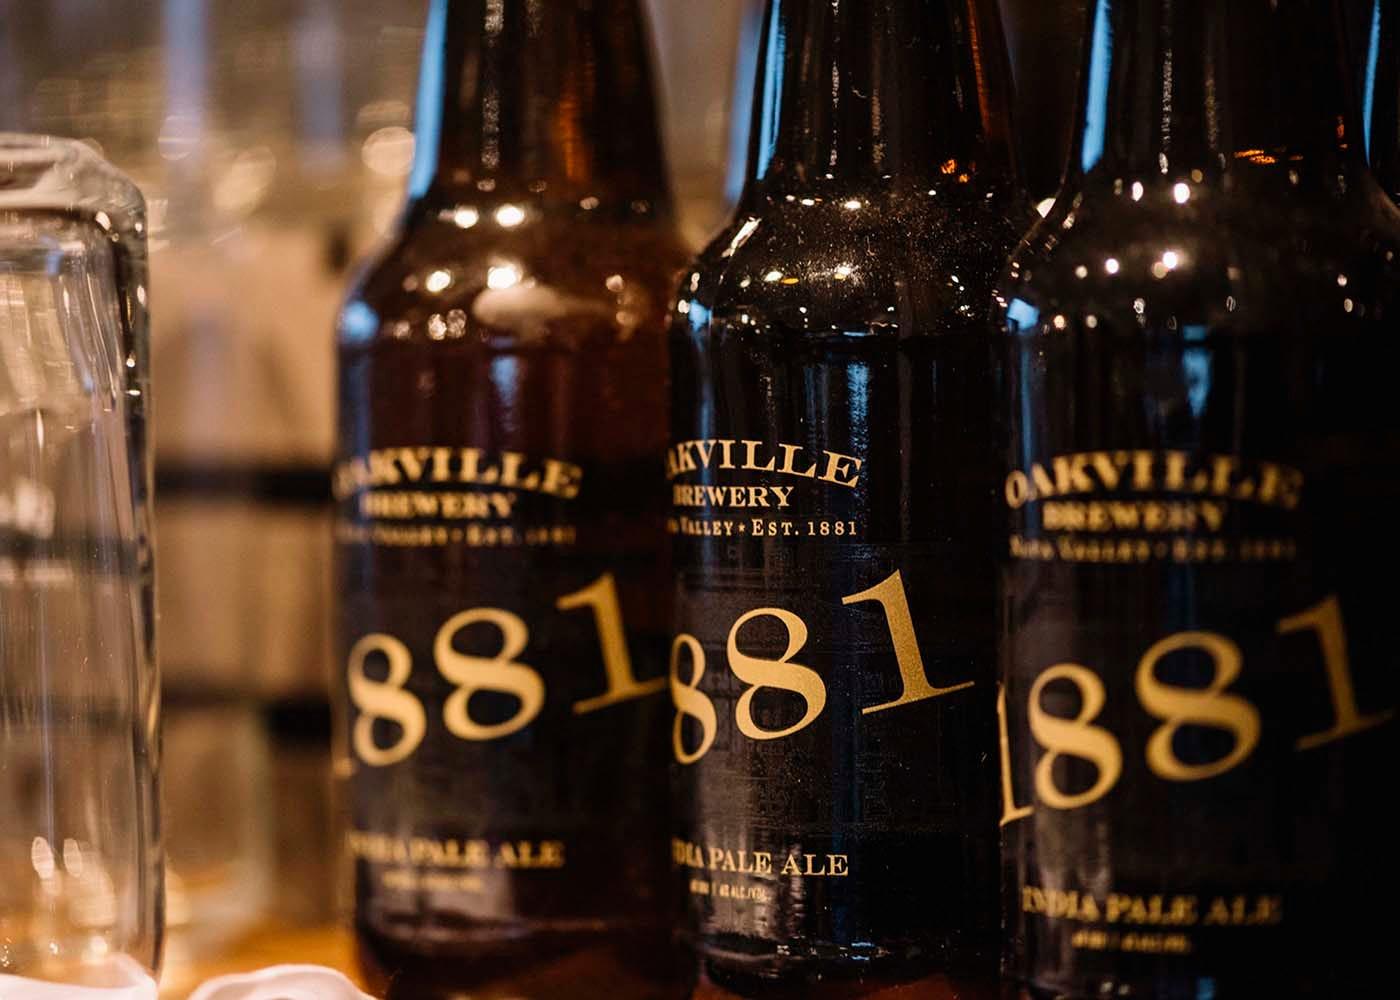 Oakville Grocery 1881 beer pale ale